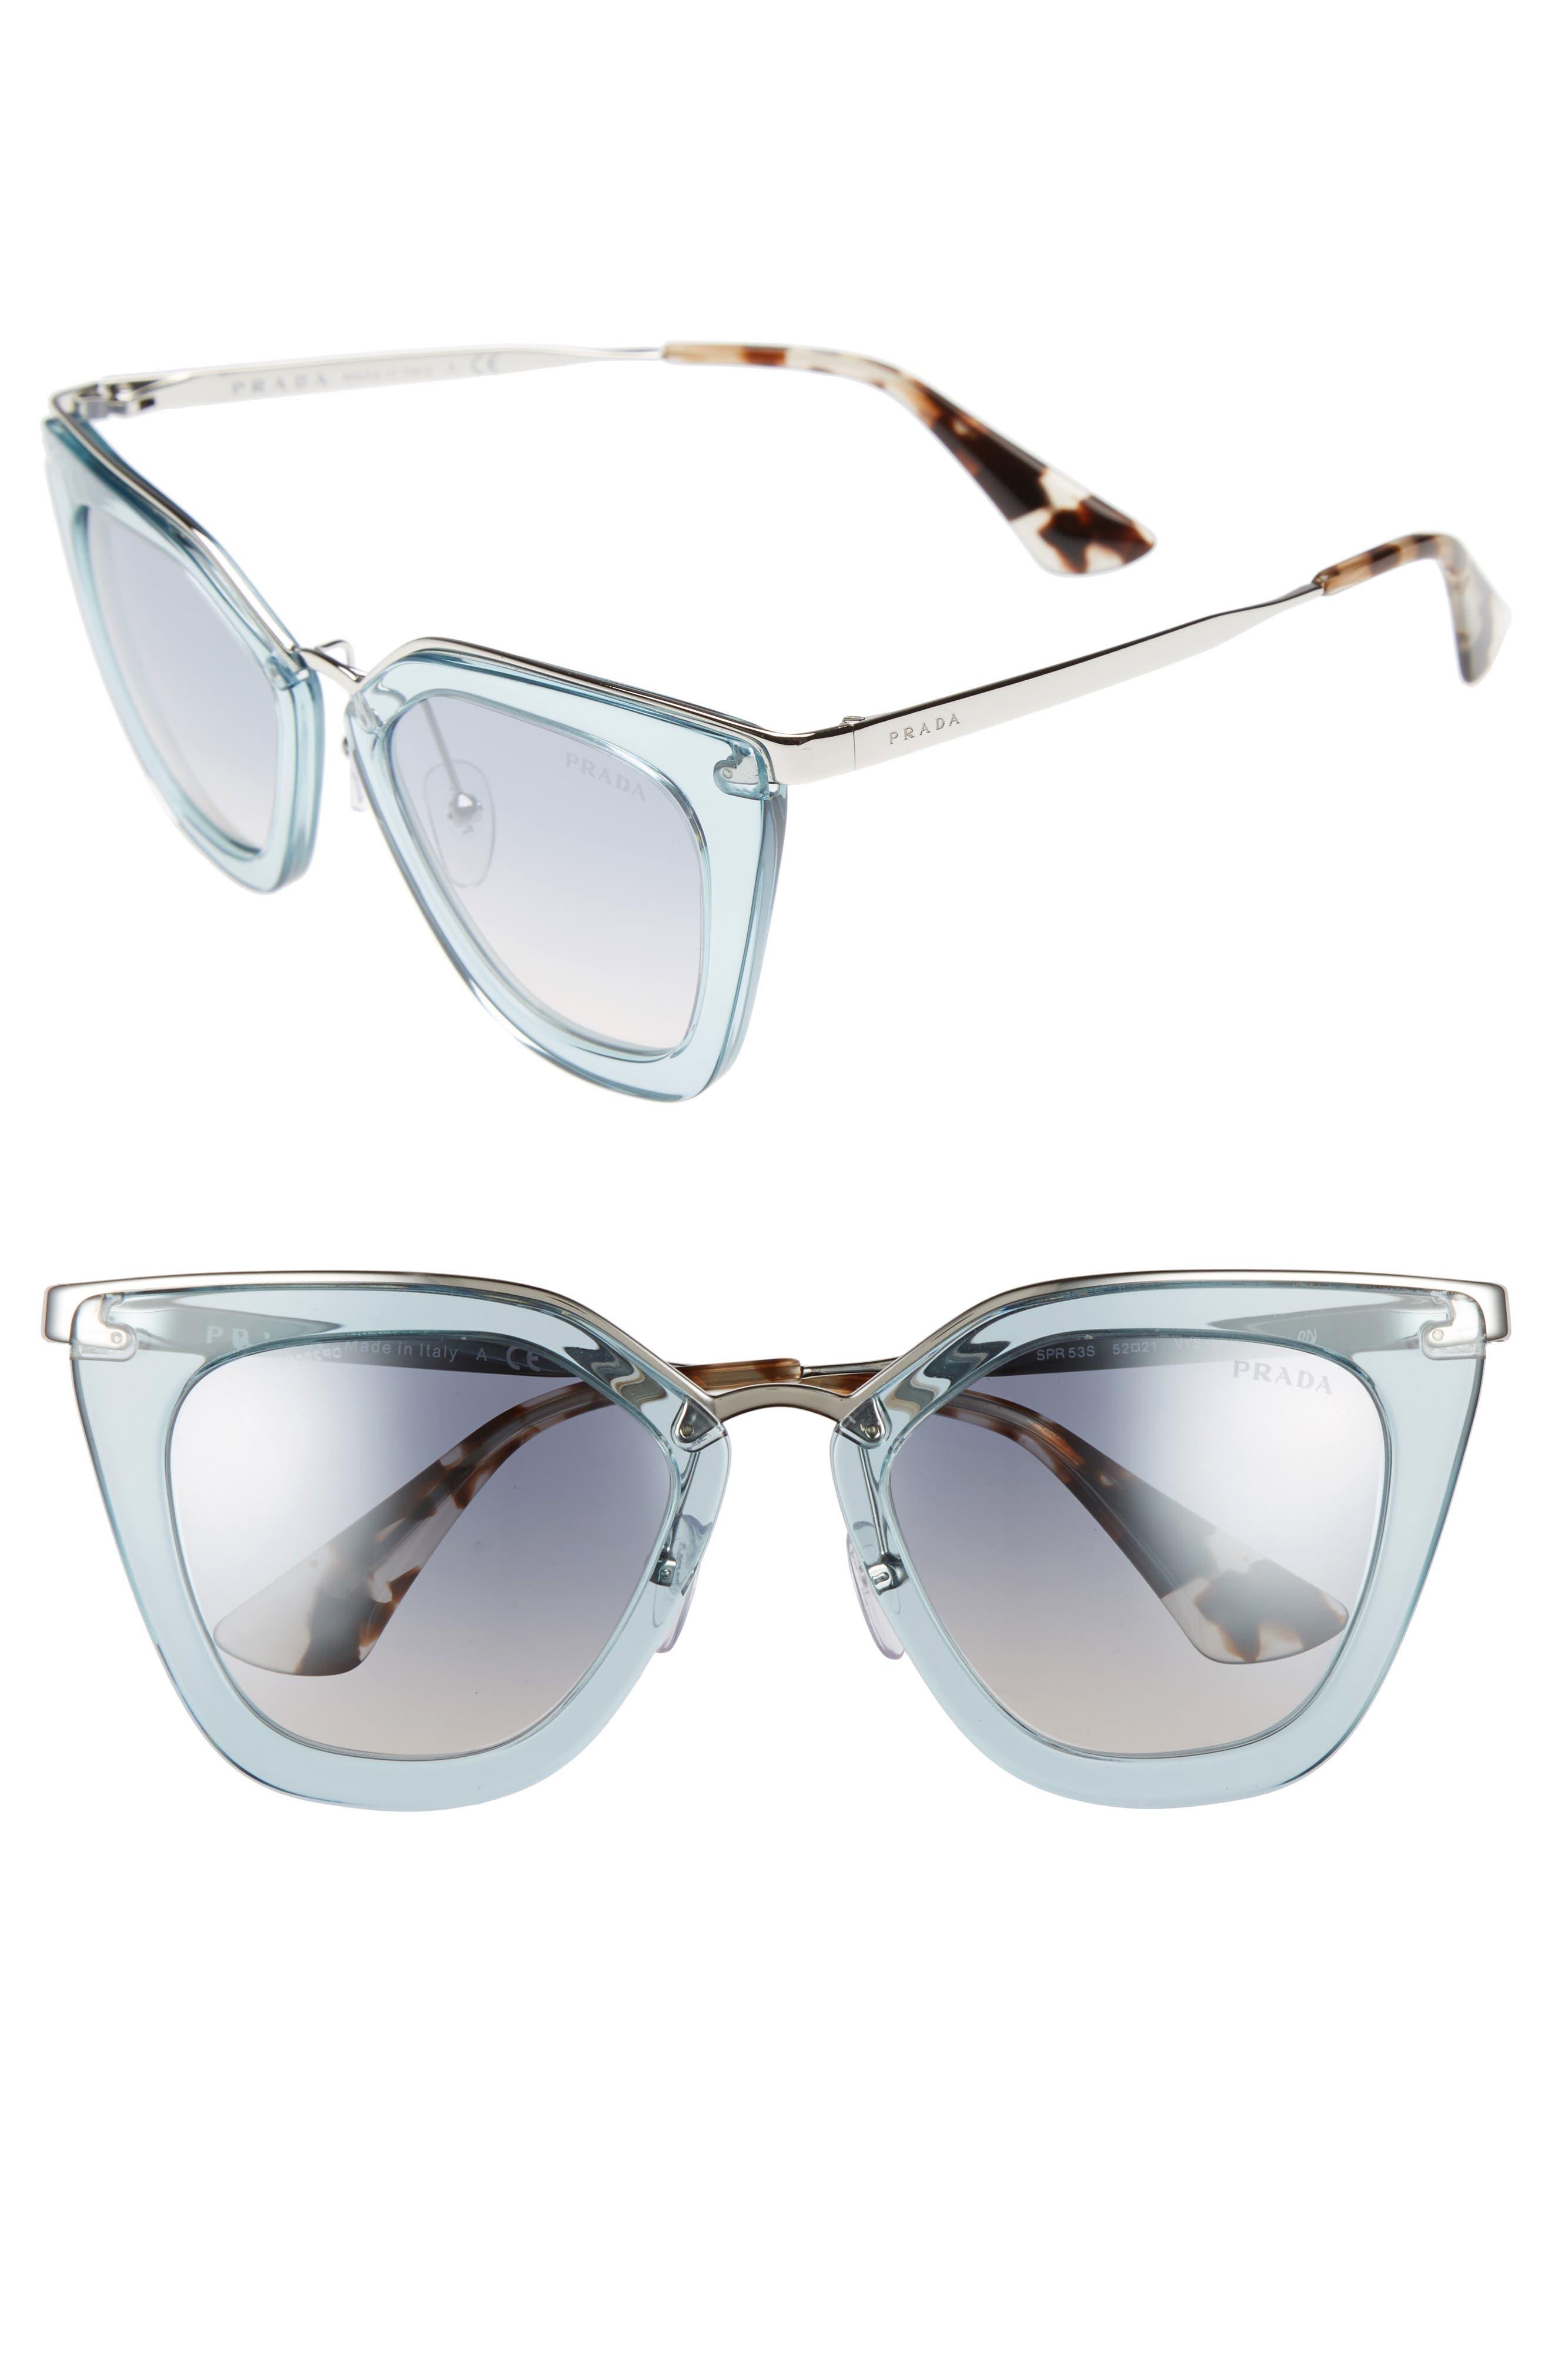 Alternate Image 1 Selected - Prada 52mm Retro Sunglasses